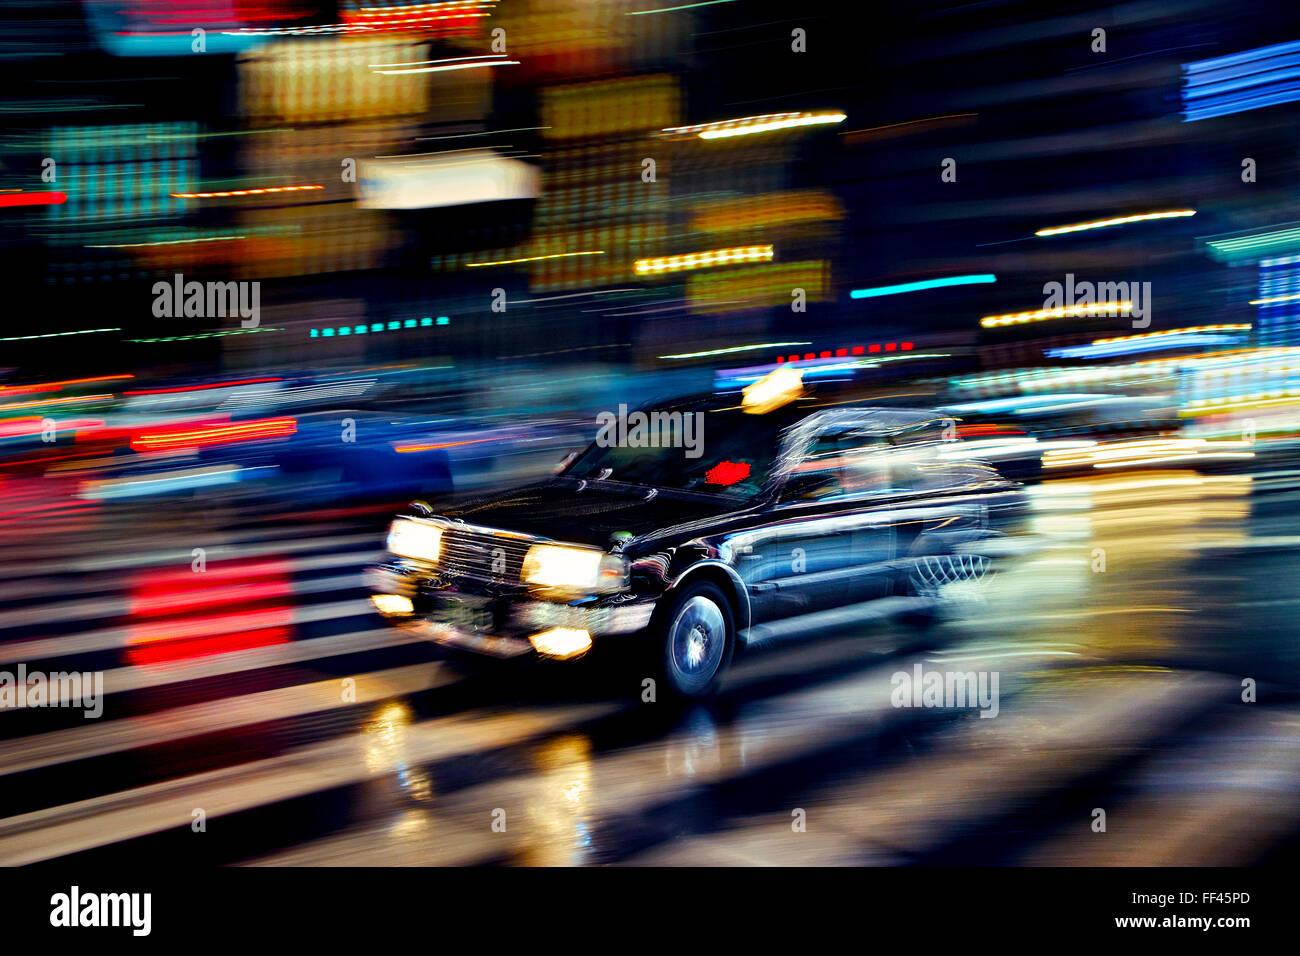 Japan, Honshu island, Kanto, Tokyo, taxi at night. - Stock Image